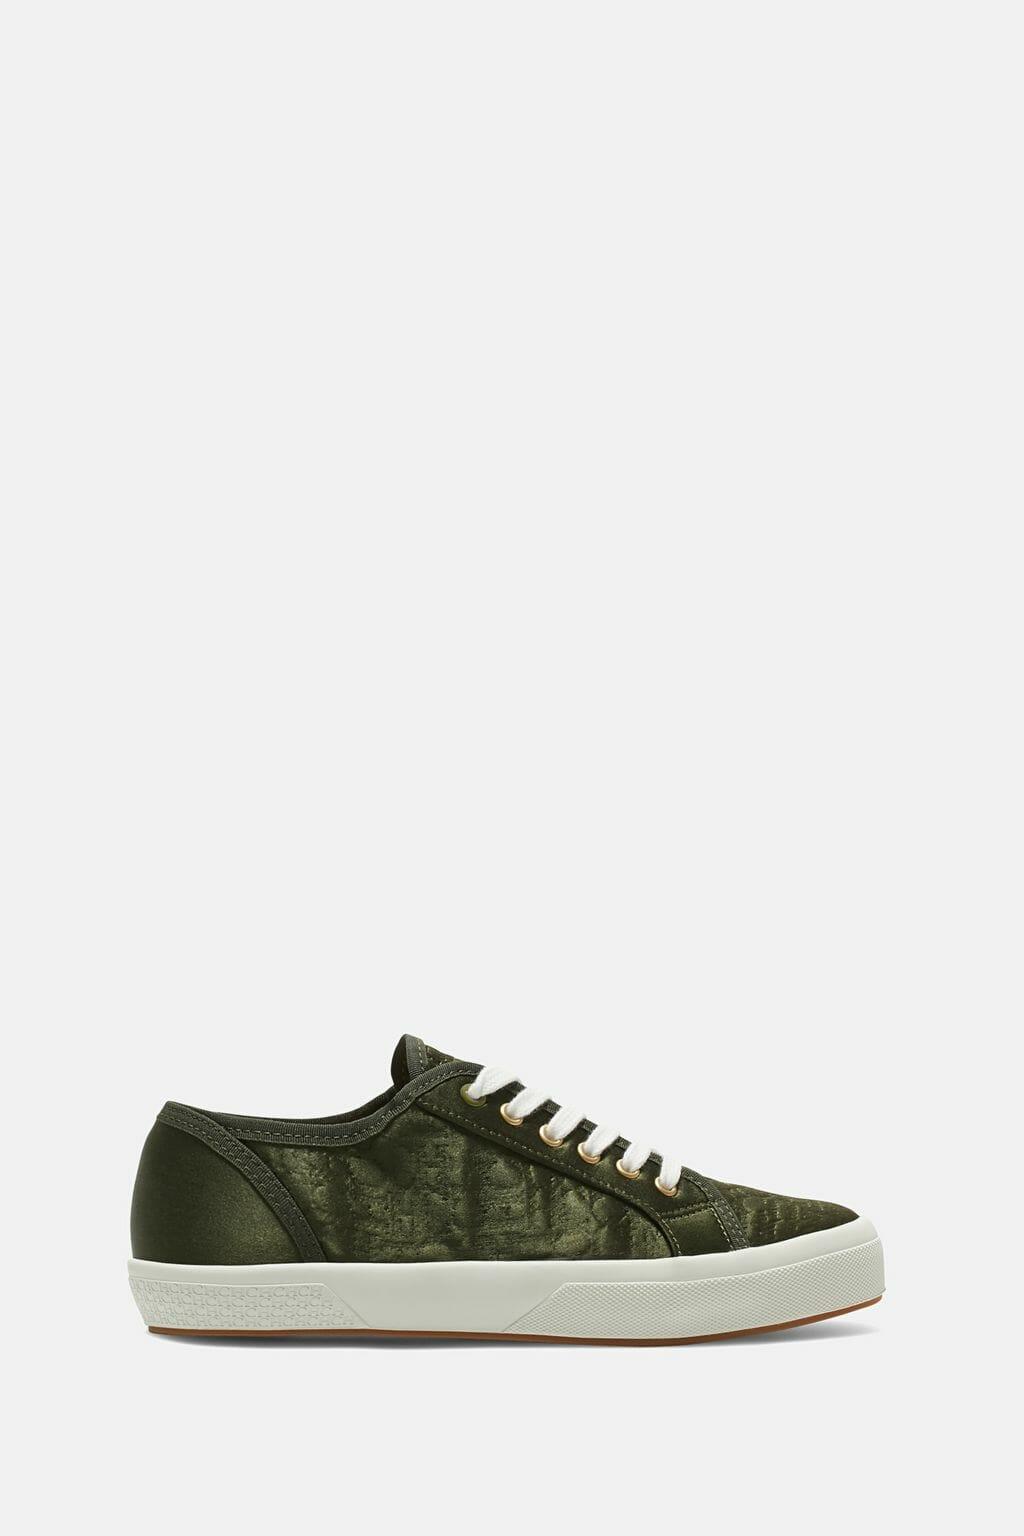 CH-Carolina-herrera-shoes-collection-Spring-Summer-2018-shoe-49